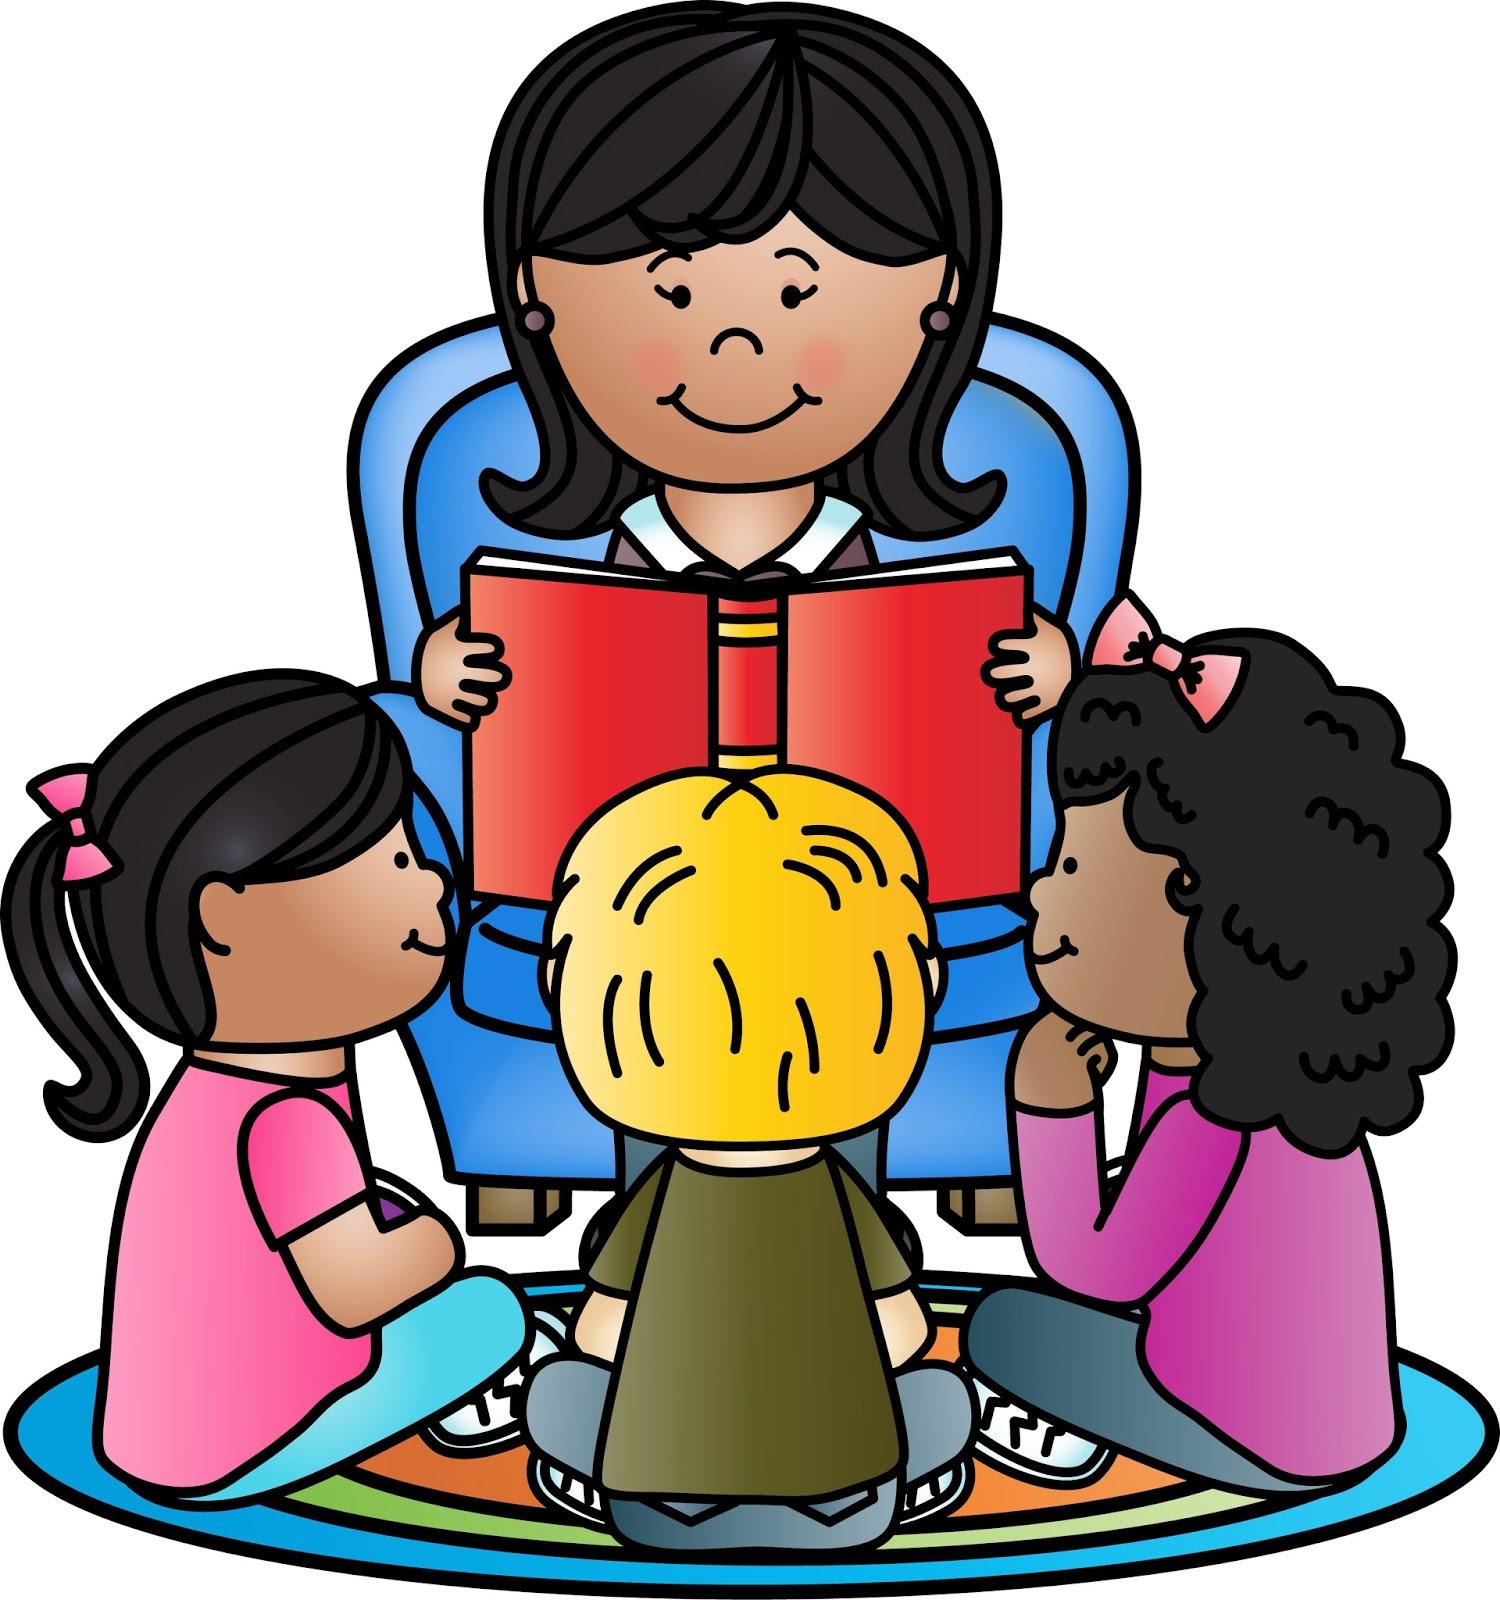 1500x1600 Preschool Kids Kindergarten Cartoon Clip Art Illustration 2